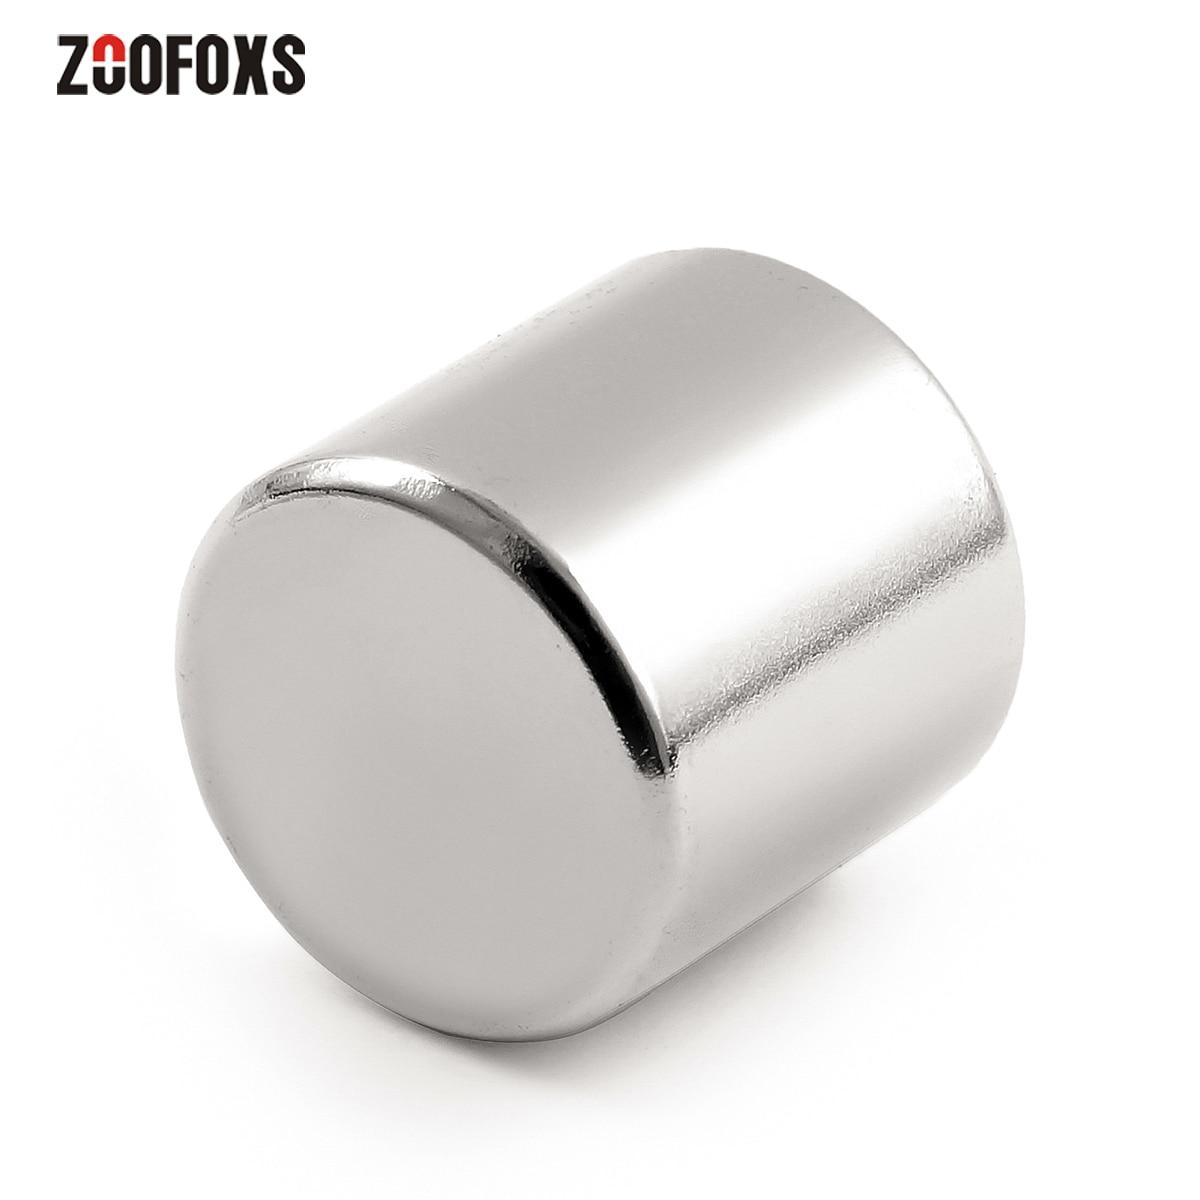 Zoofoxs 1pc 20x20m n35 redondo cilindro ímã de neodímio terra rara super forte 20x20mm ímãs permanentes 20*20mm